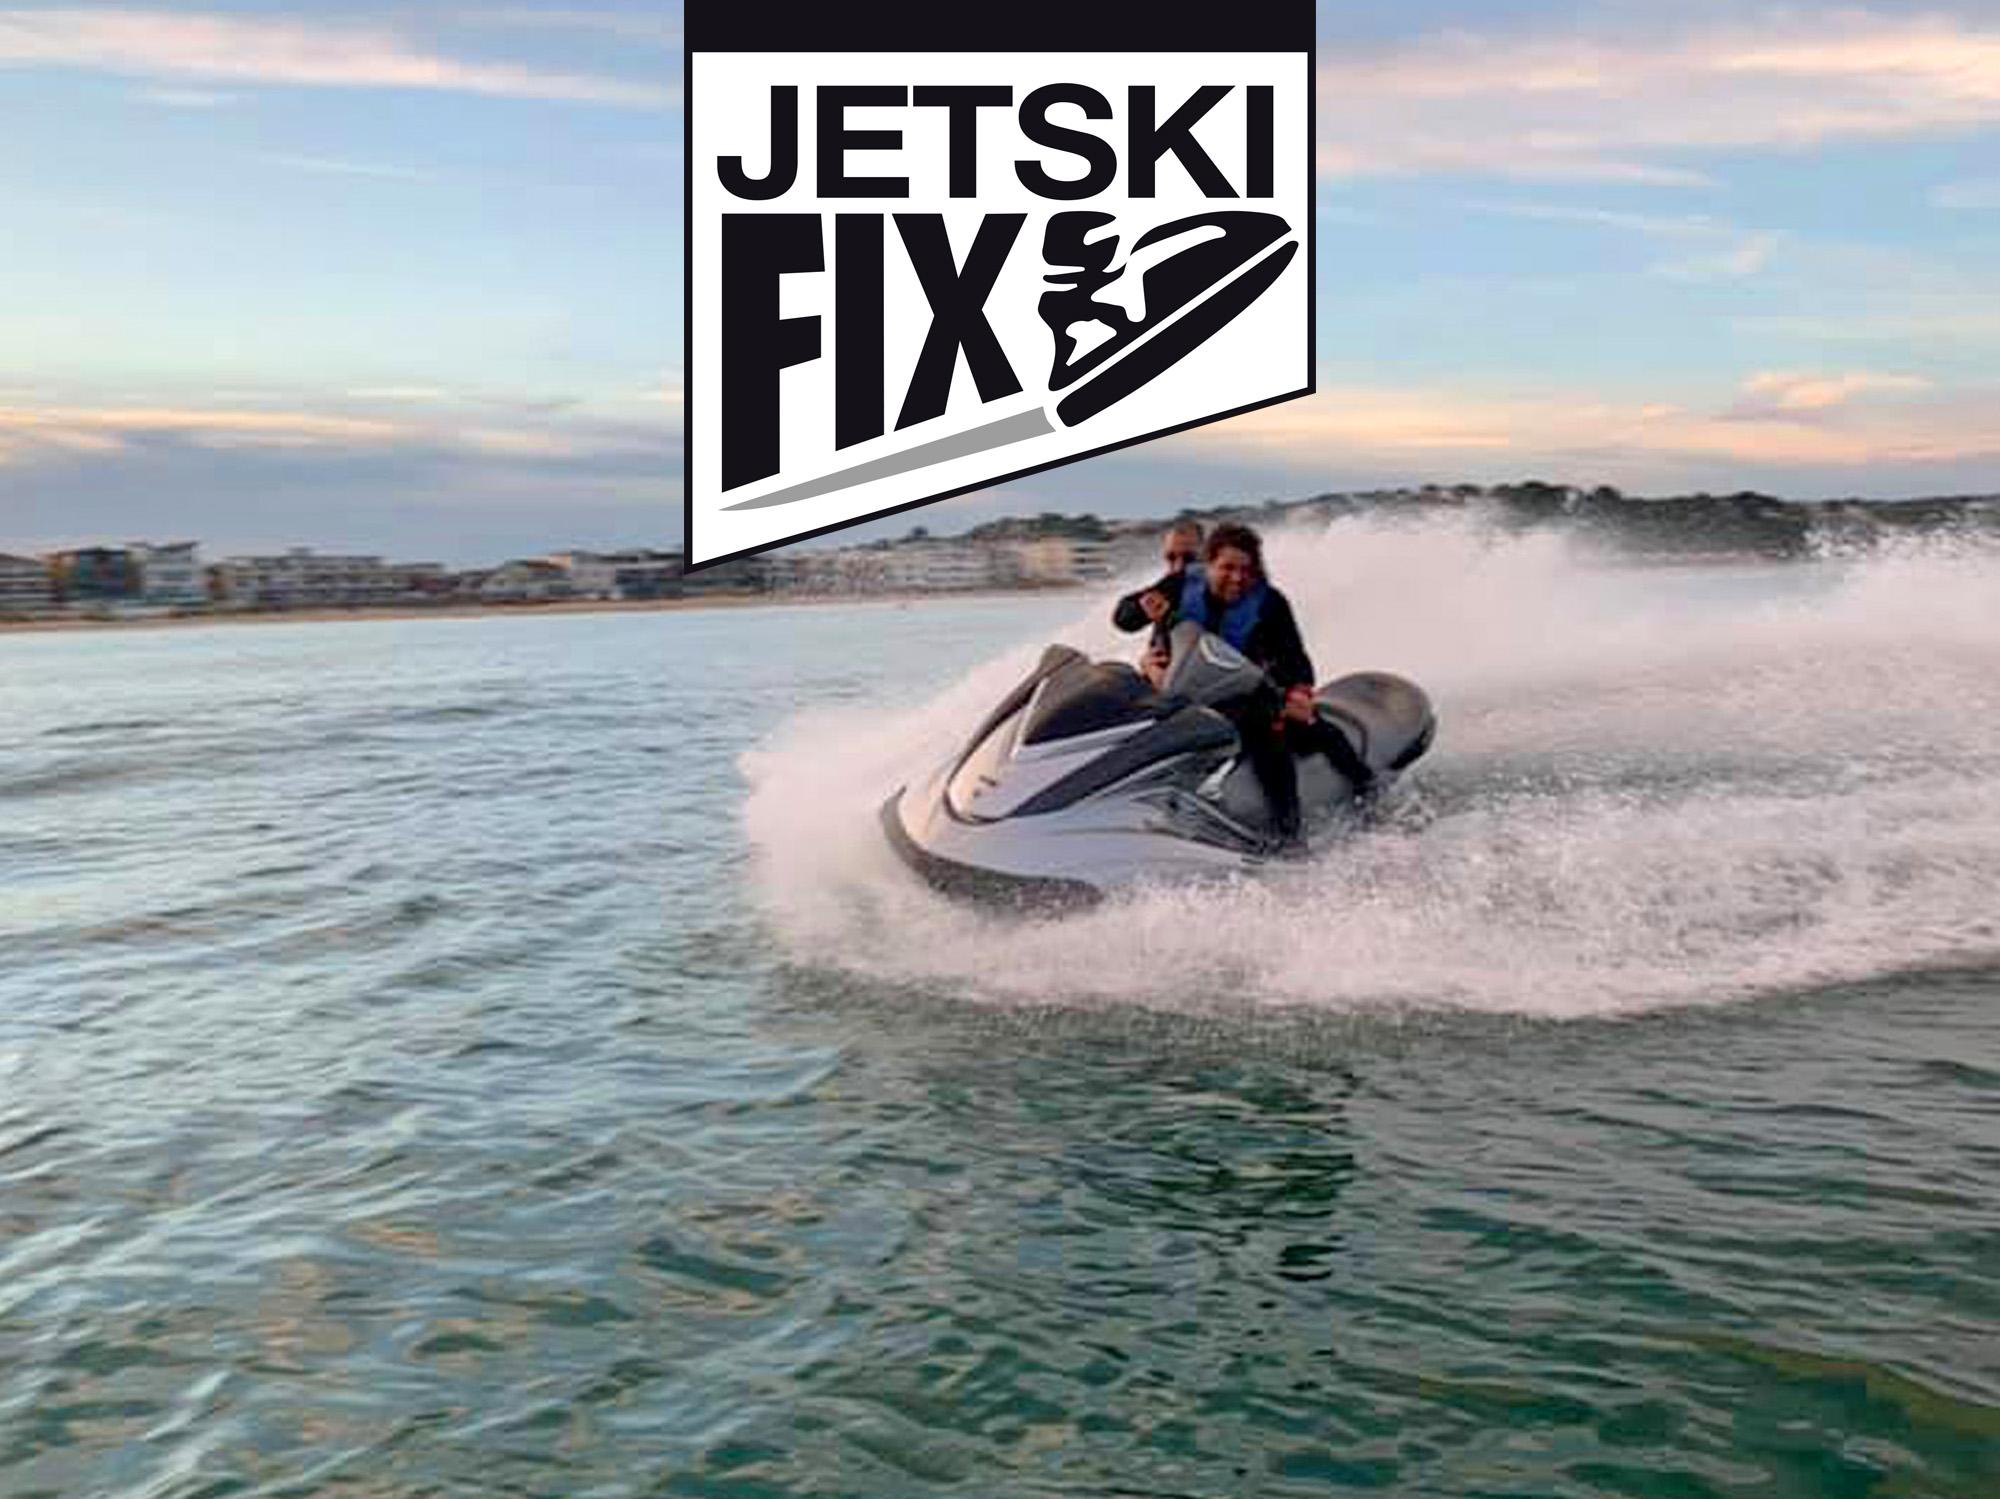 Jetskifix sandbanks spray